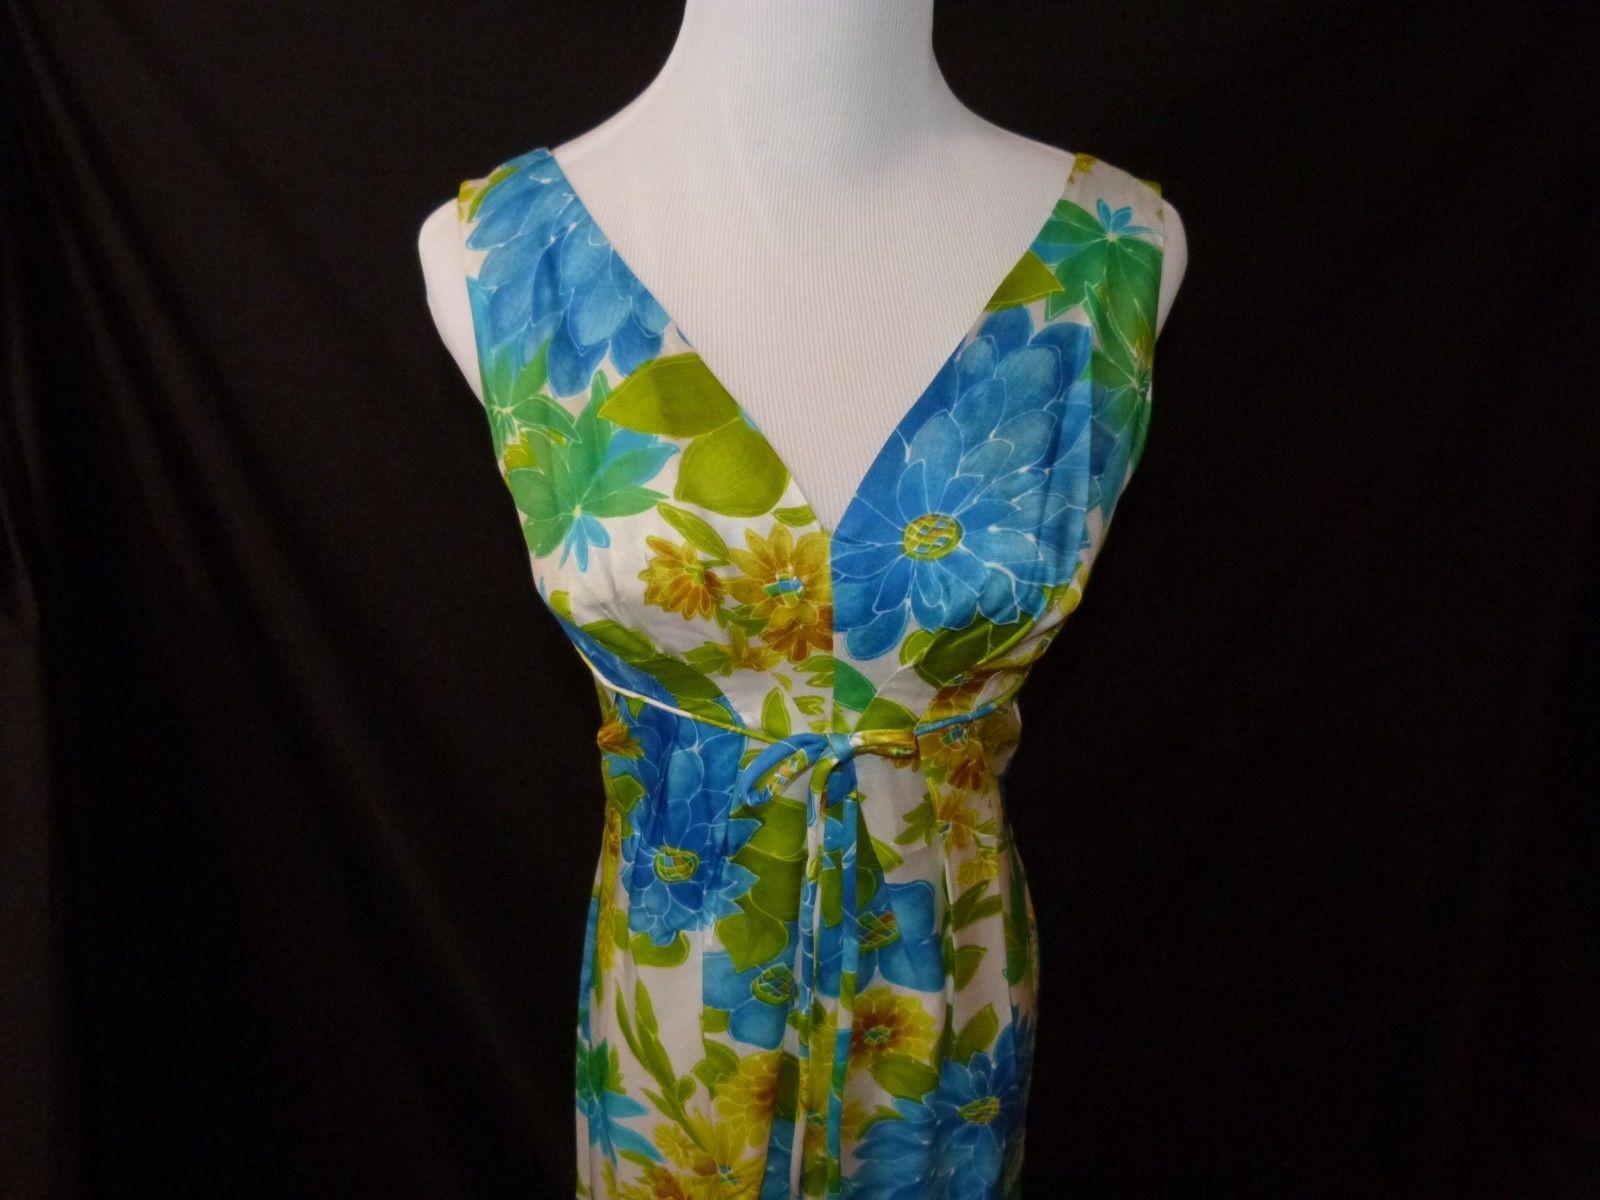 Vtg LAUHALA Hawaiian Hostess Dress Ladies Blue Green Gold Floral S